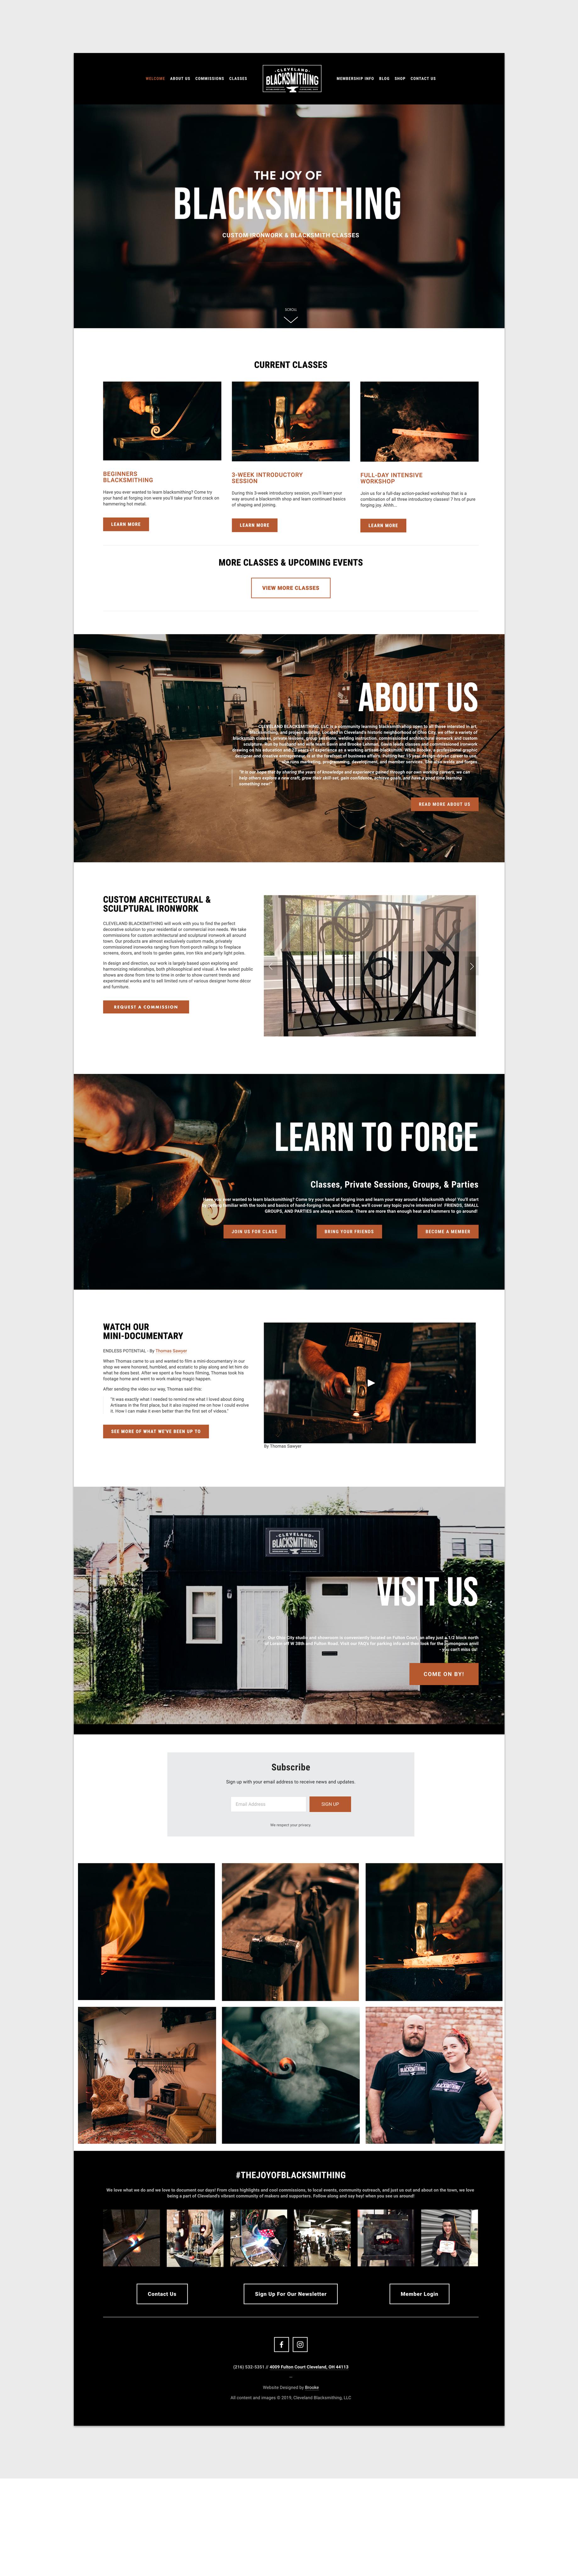 cb-website.png